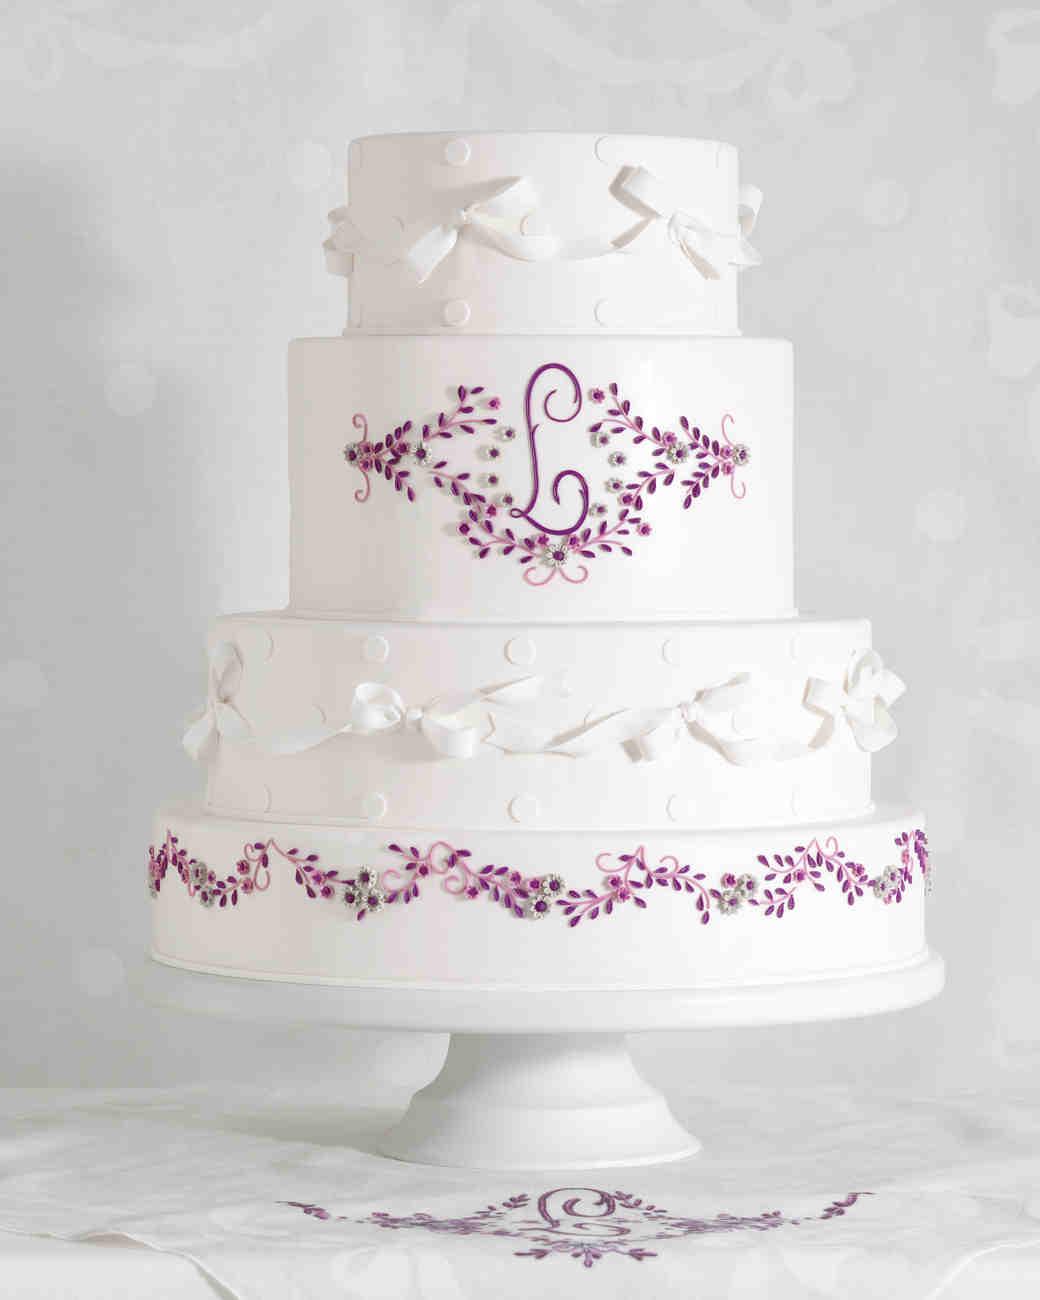 lilac-cake-108-d111019.jpg